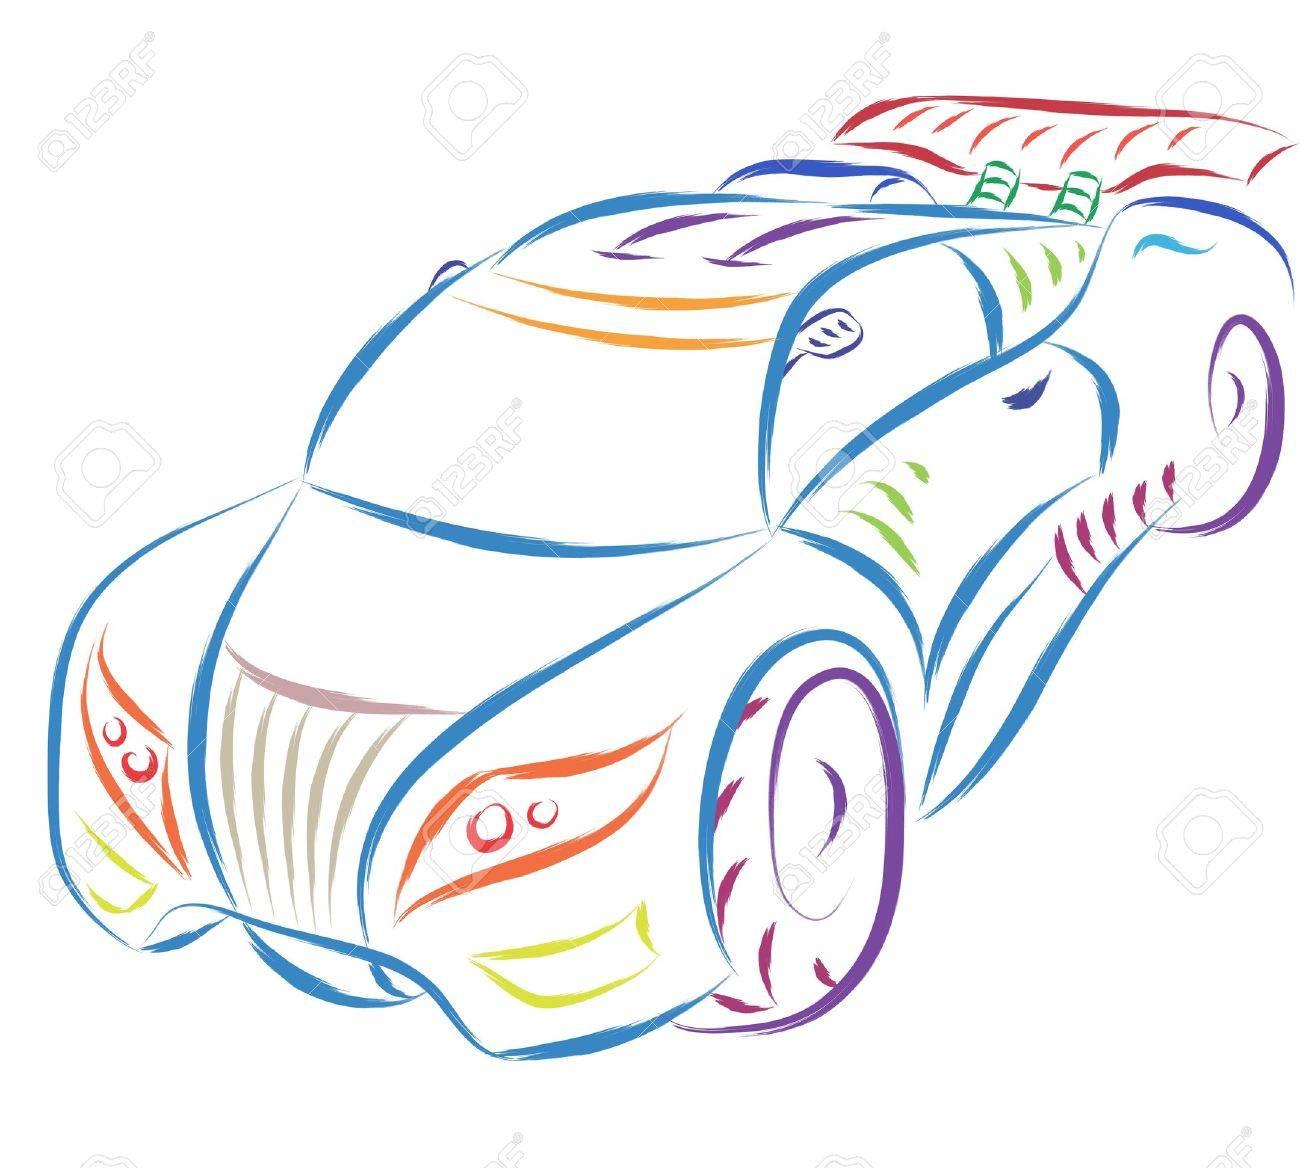 abstract sports car sketch royalty free cliparts vectors and